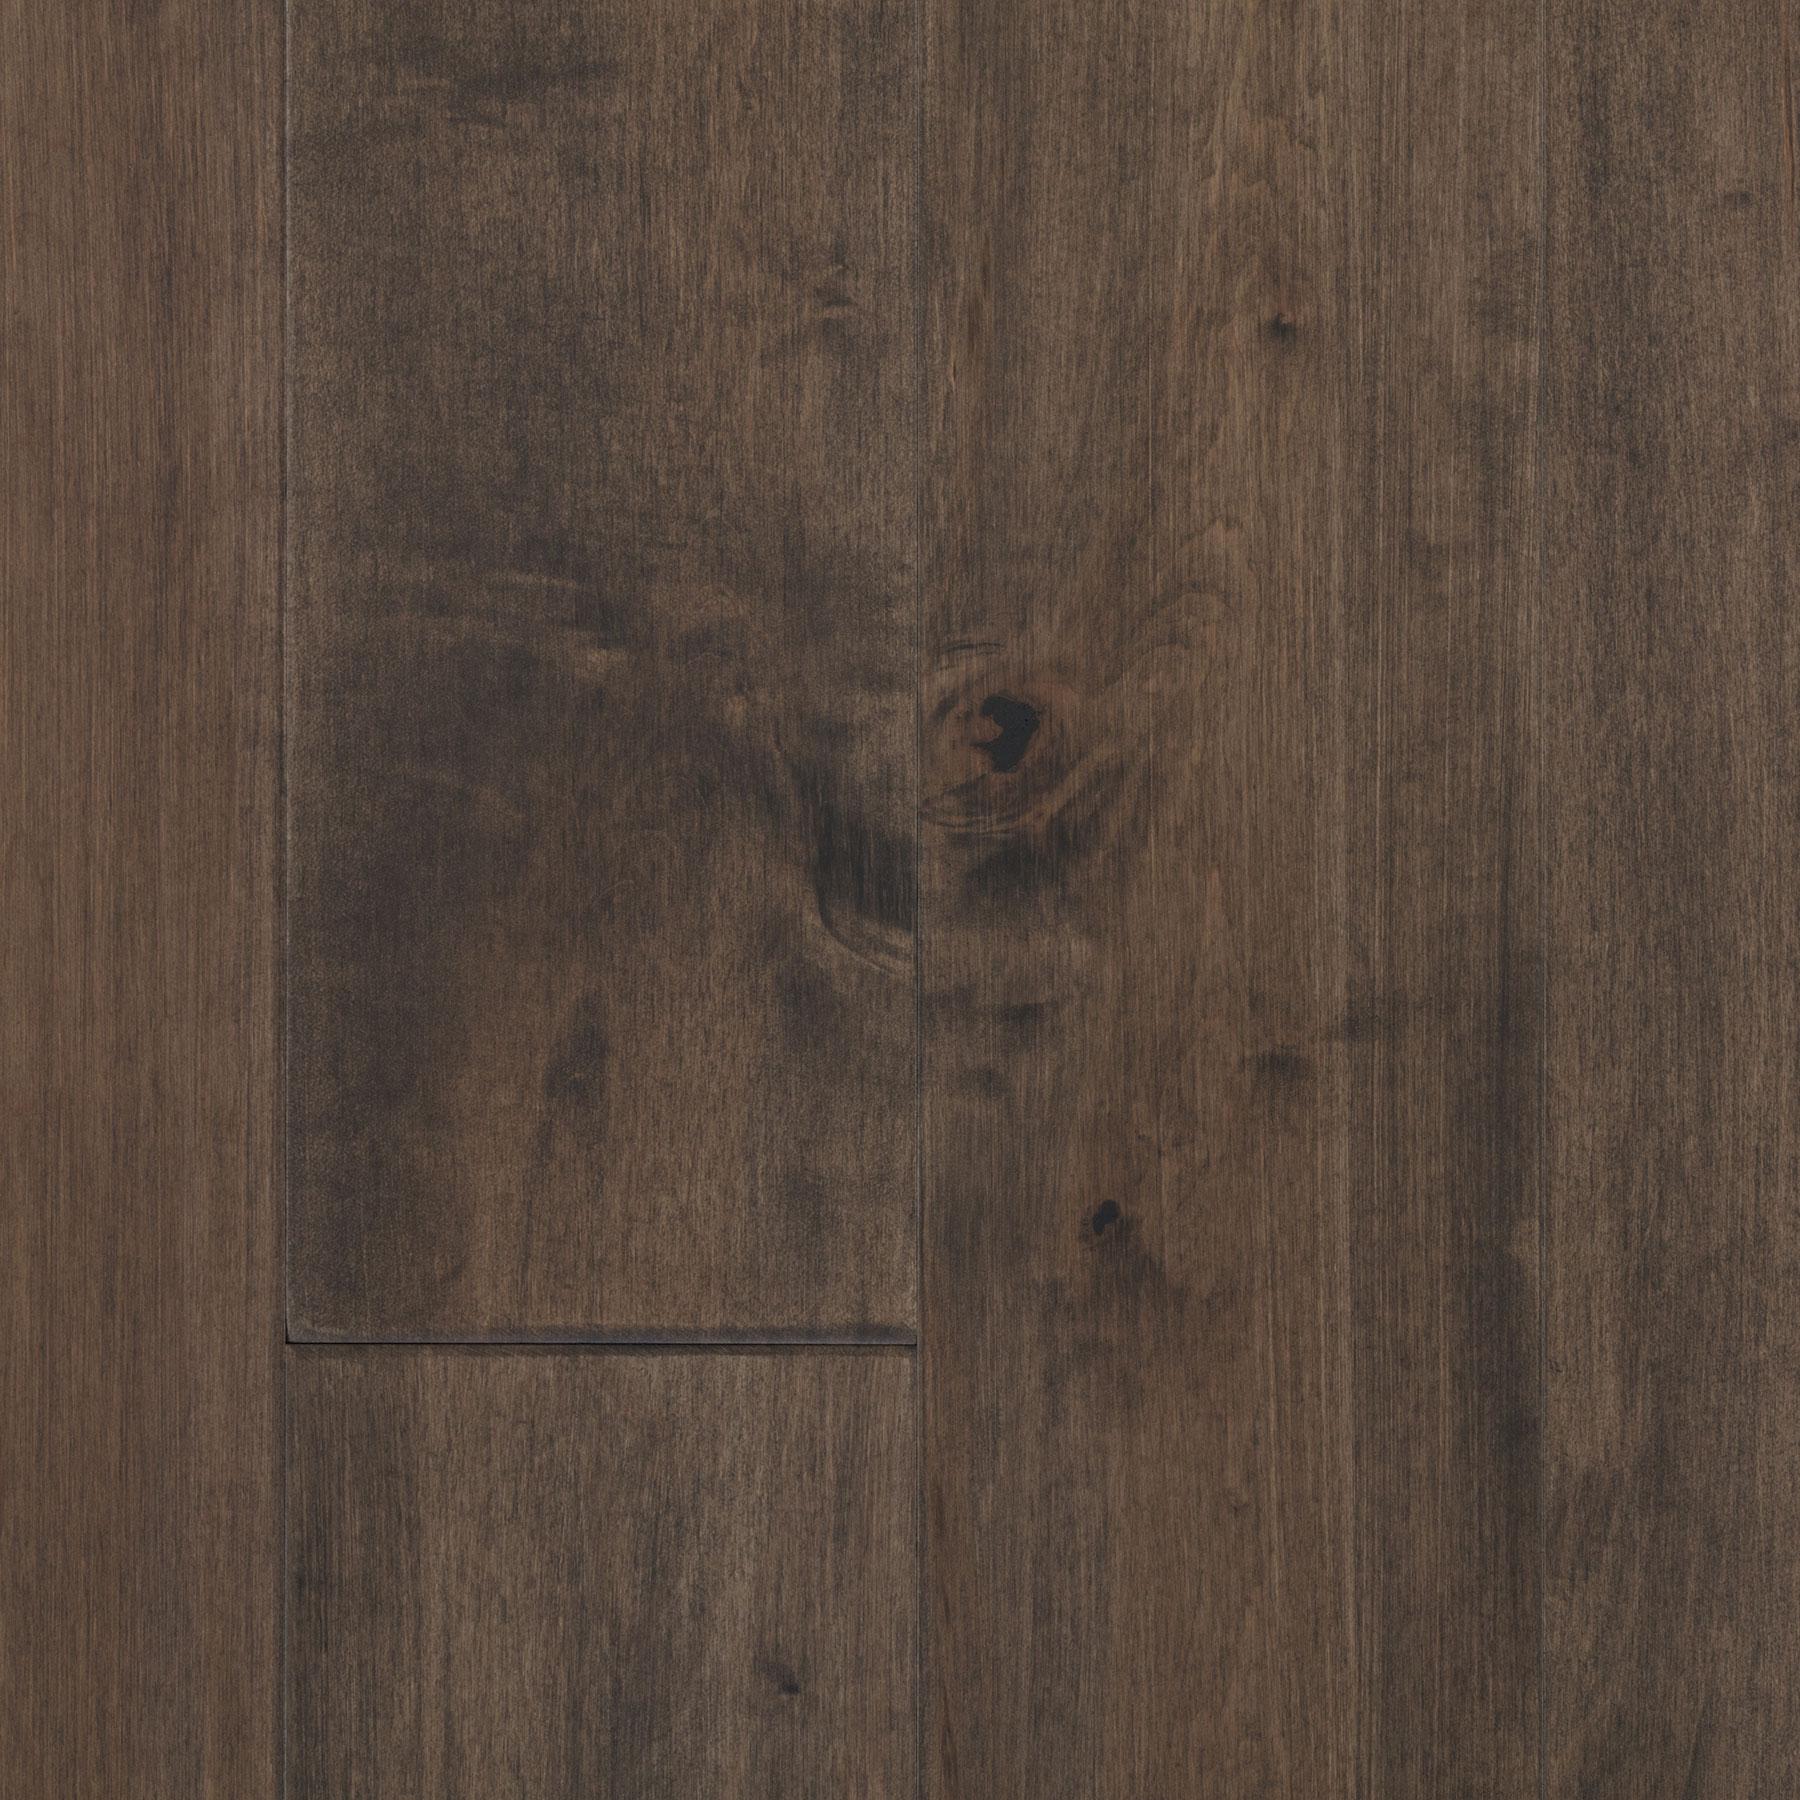 Tesoro Woods Maple Wood Flooring Coastal Lowlands Clay